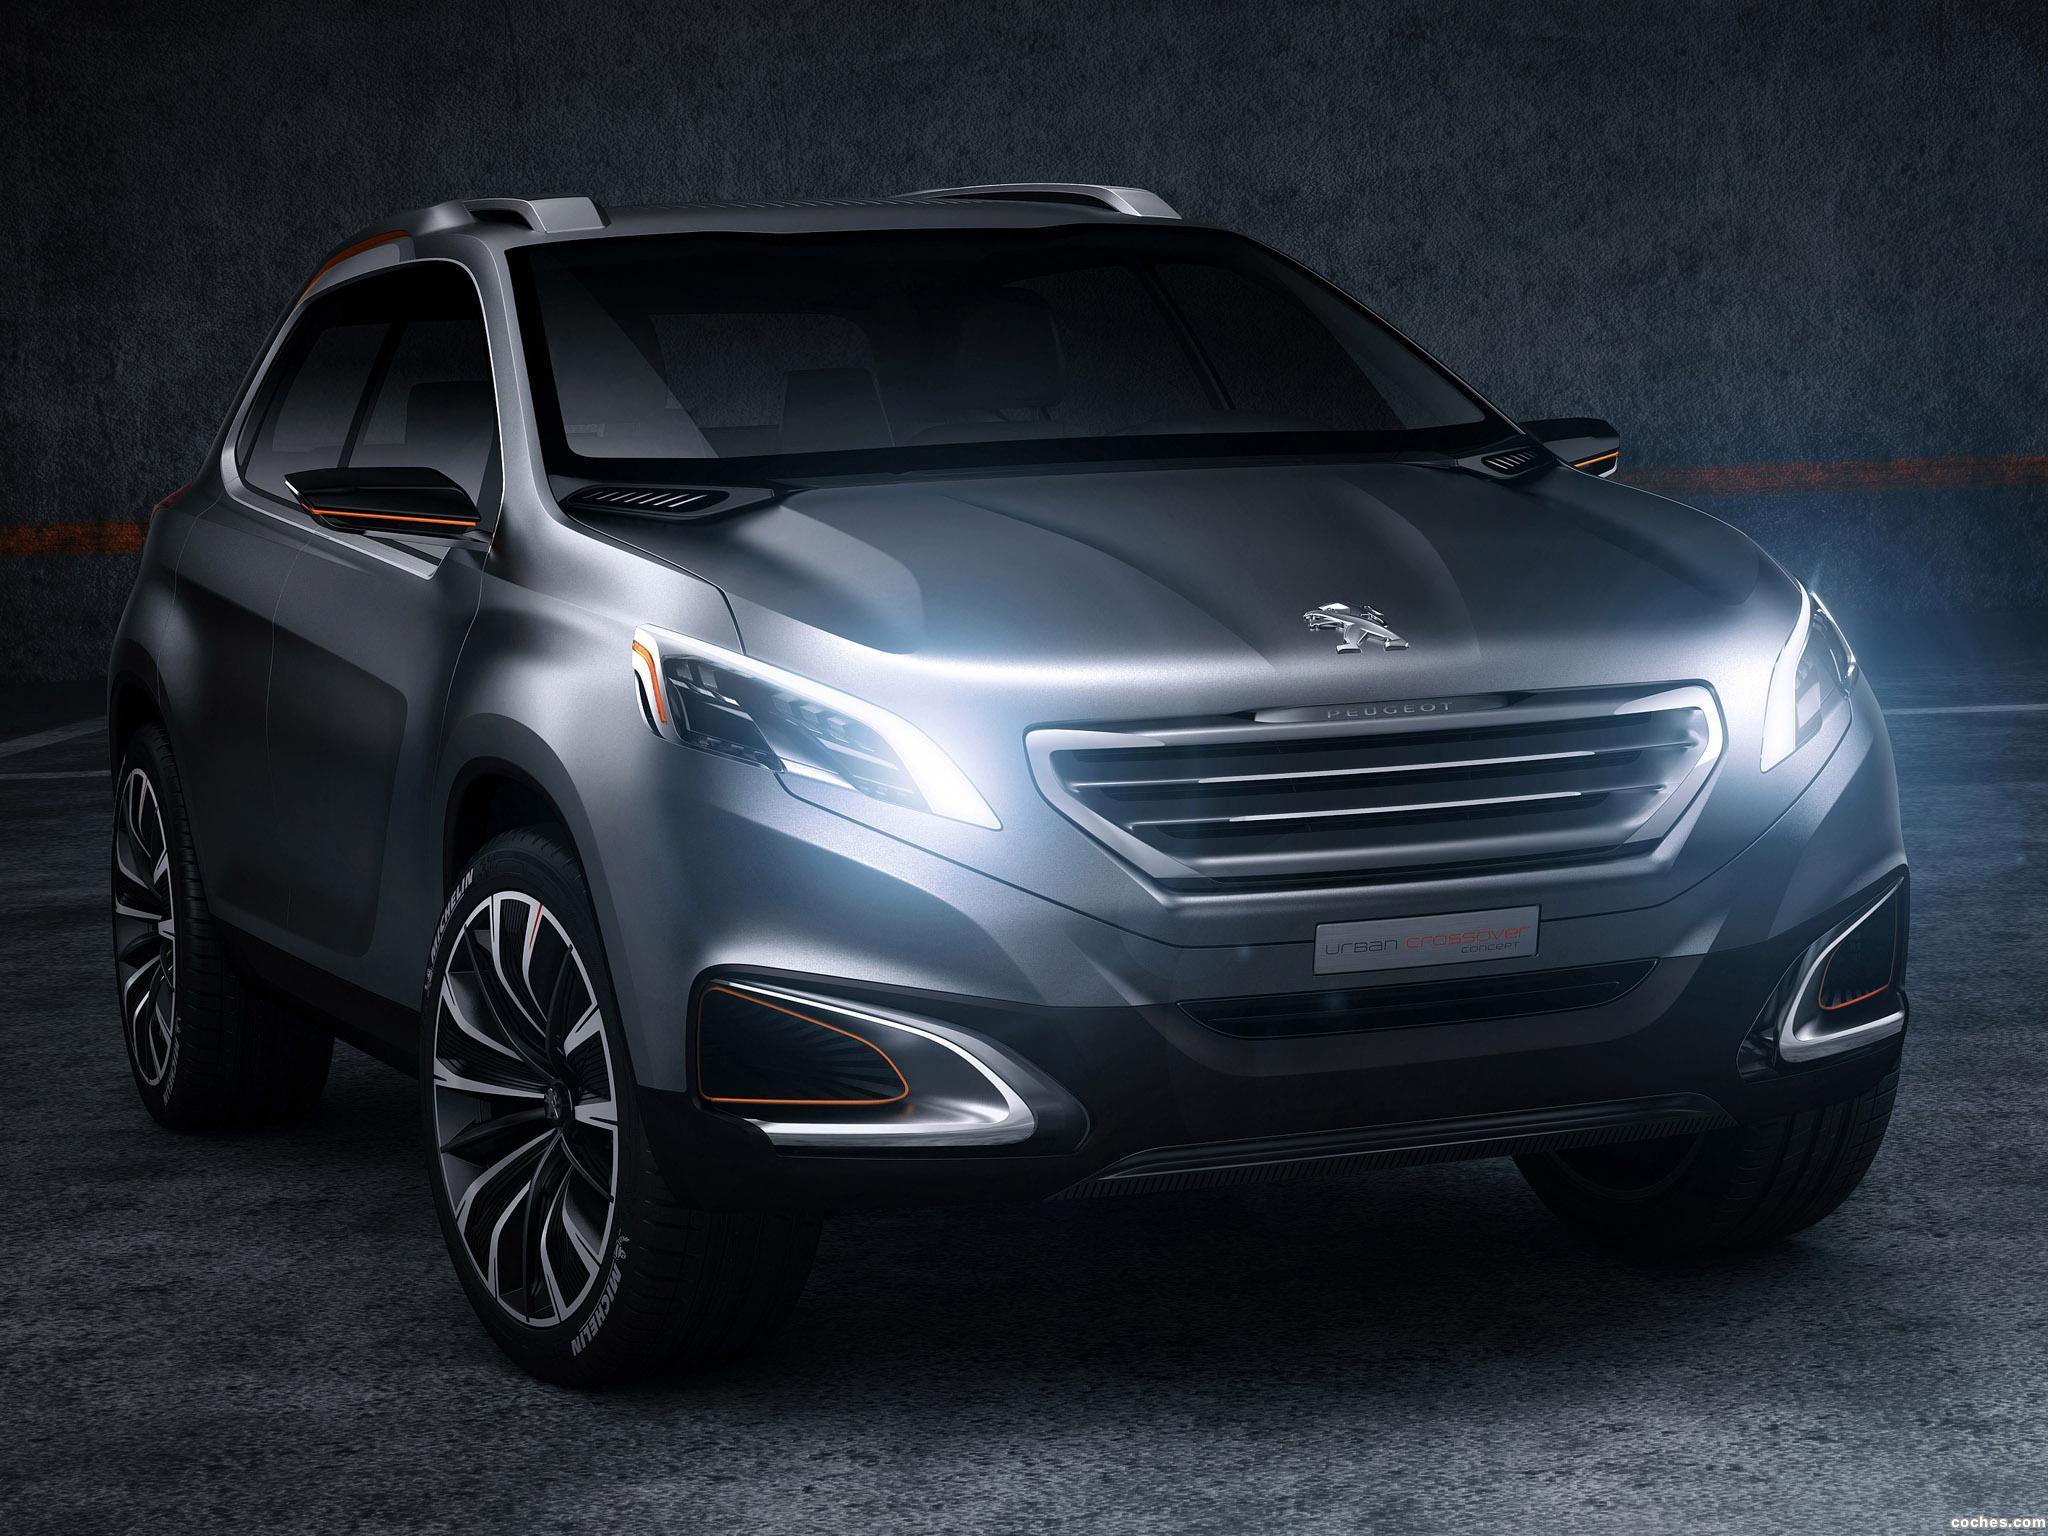 Foto 0 de Peugeot Urban Crossover Concept 2012